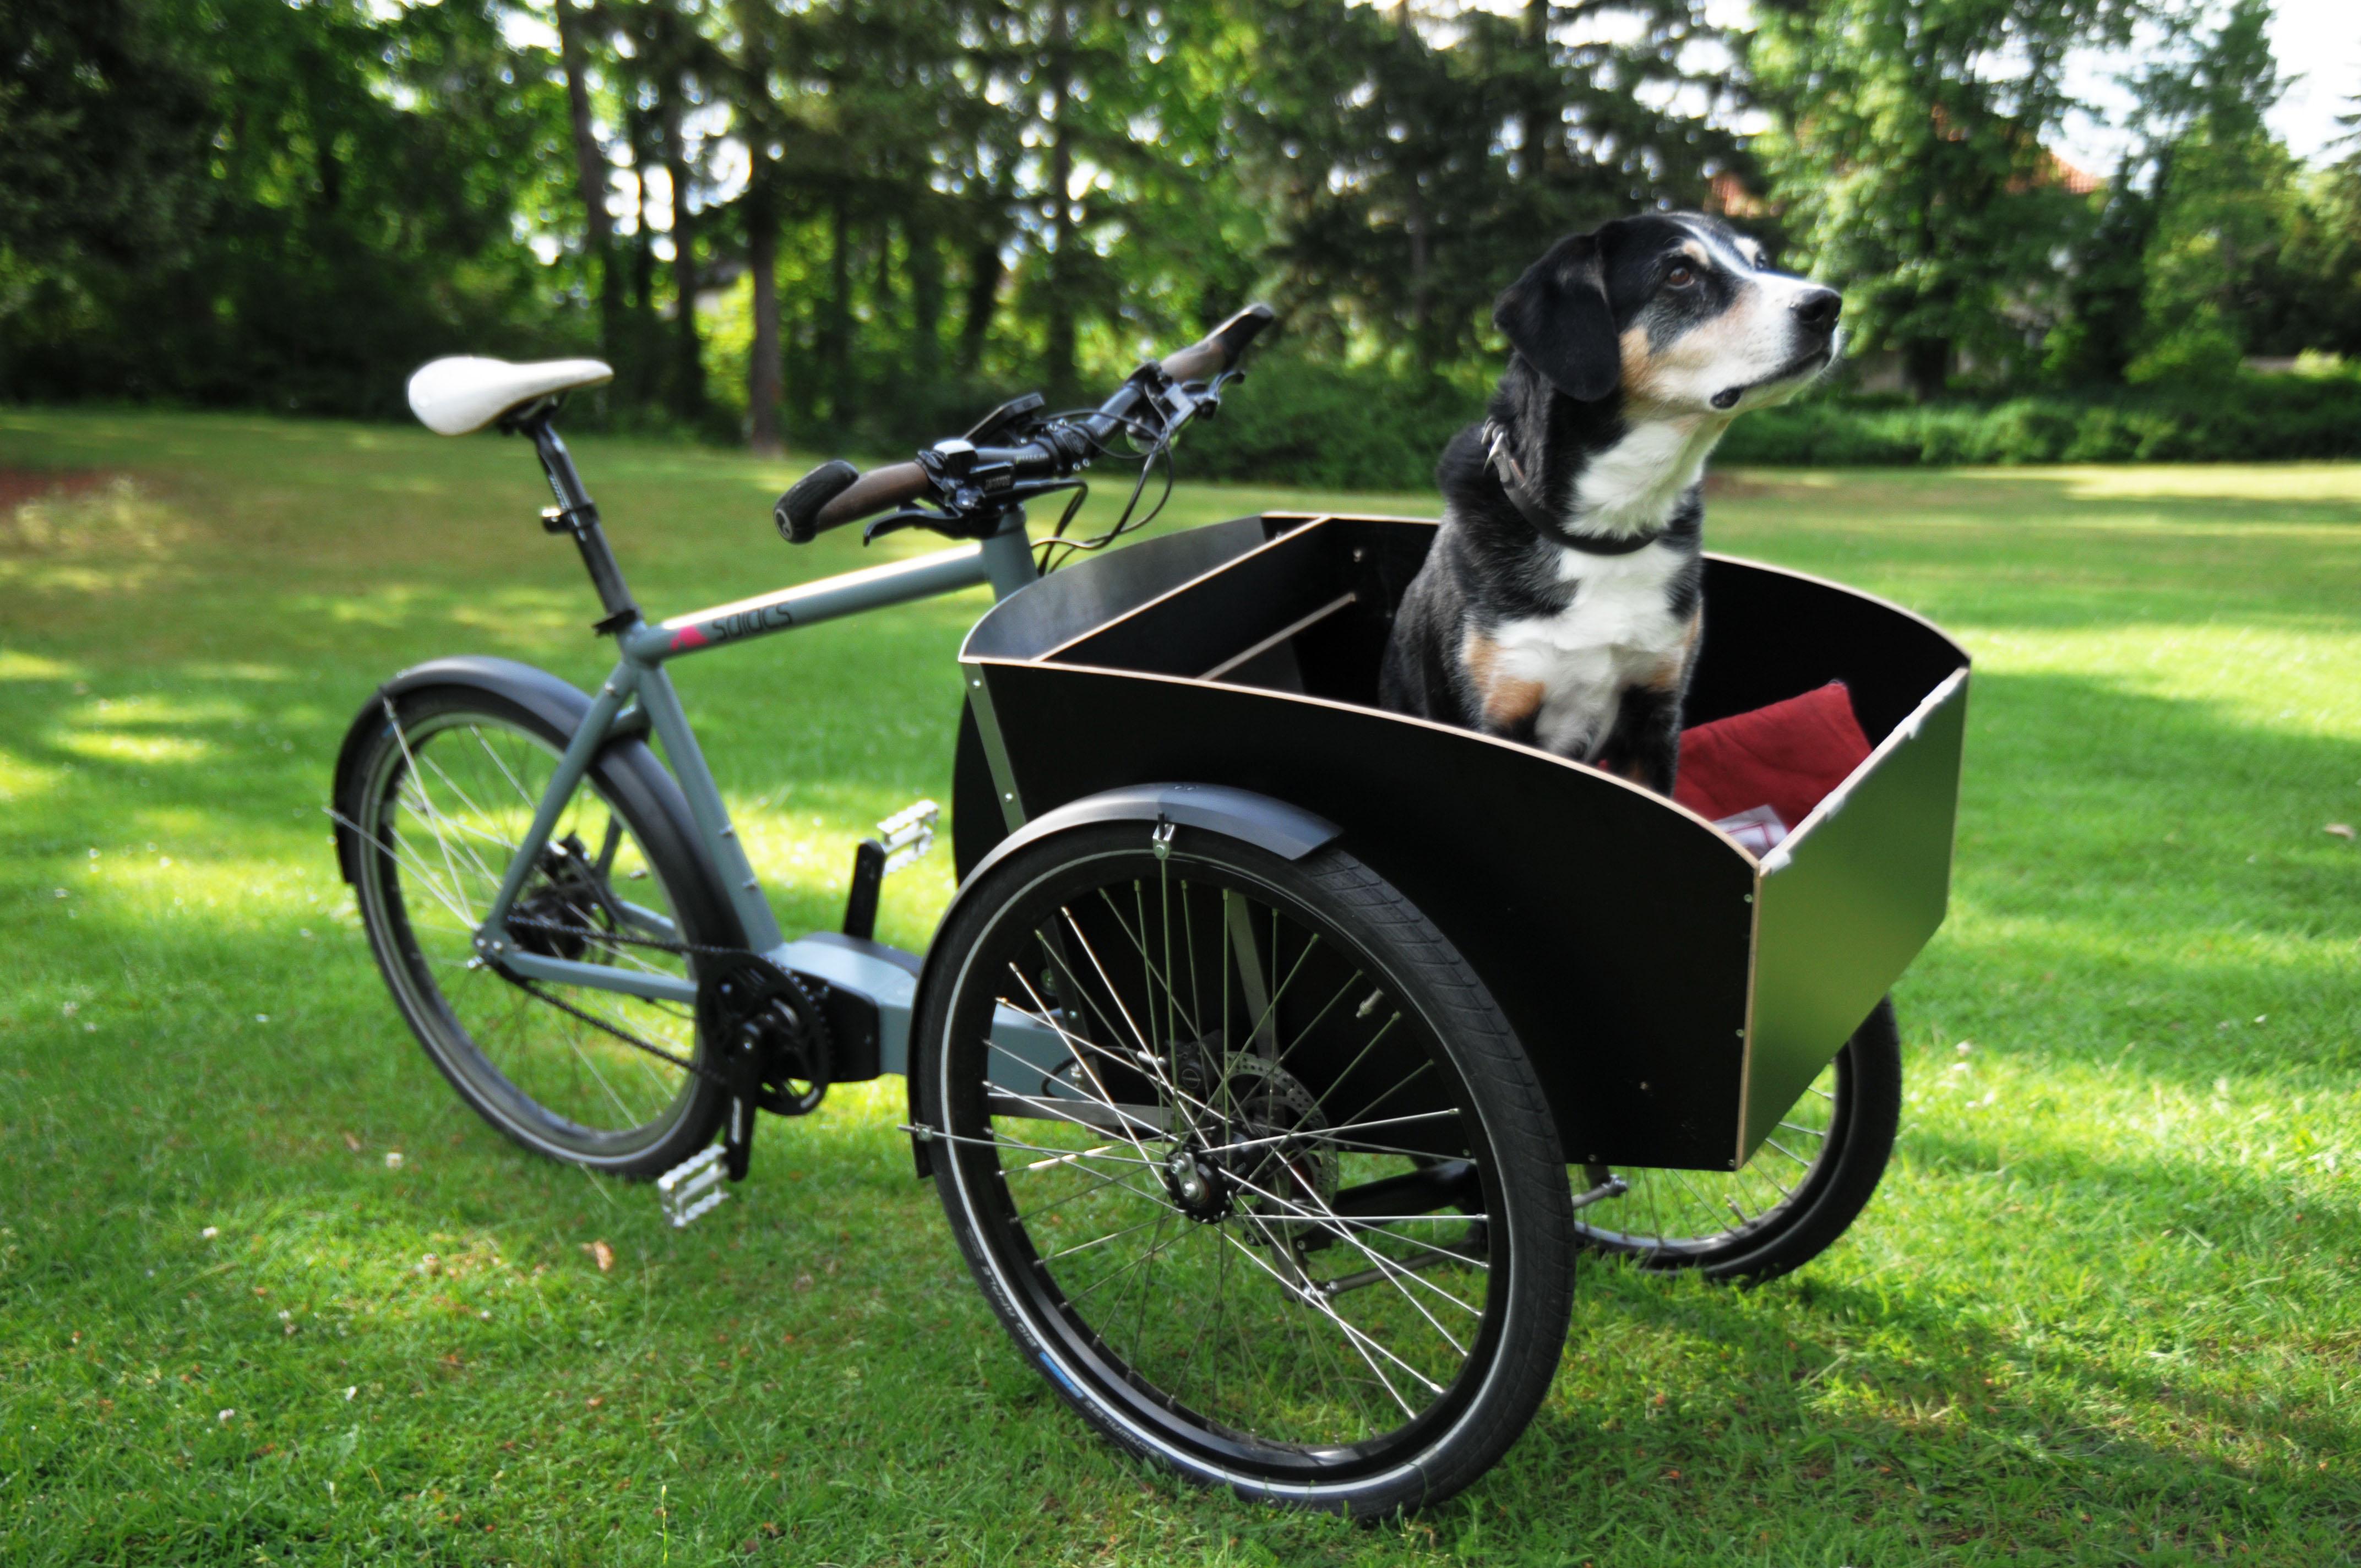 bygge el sykkel selv